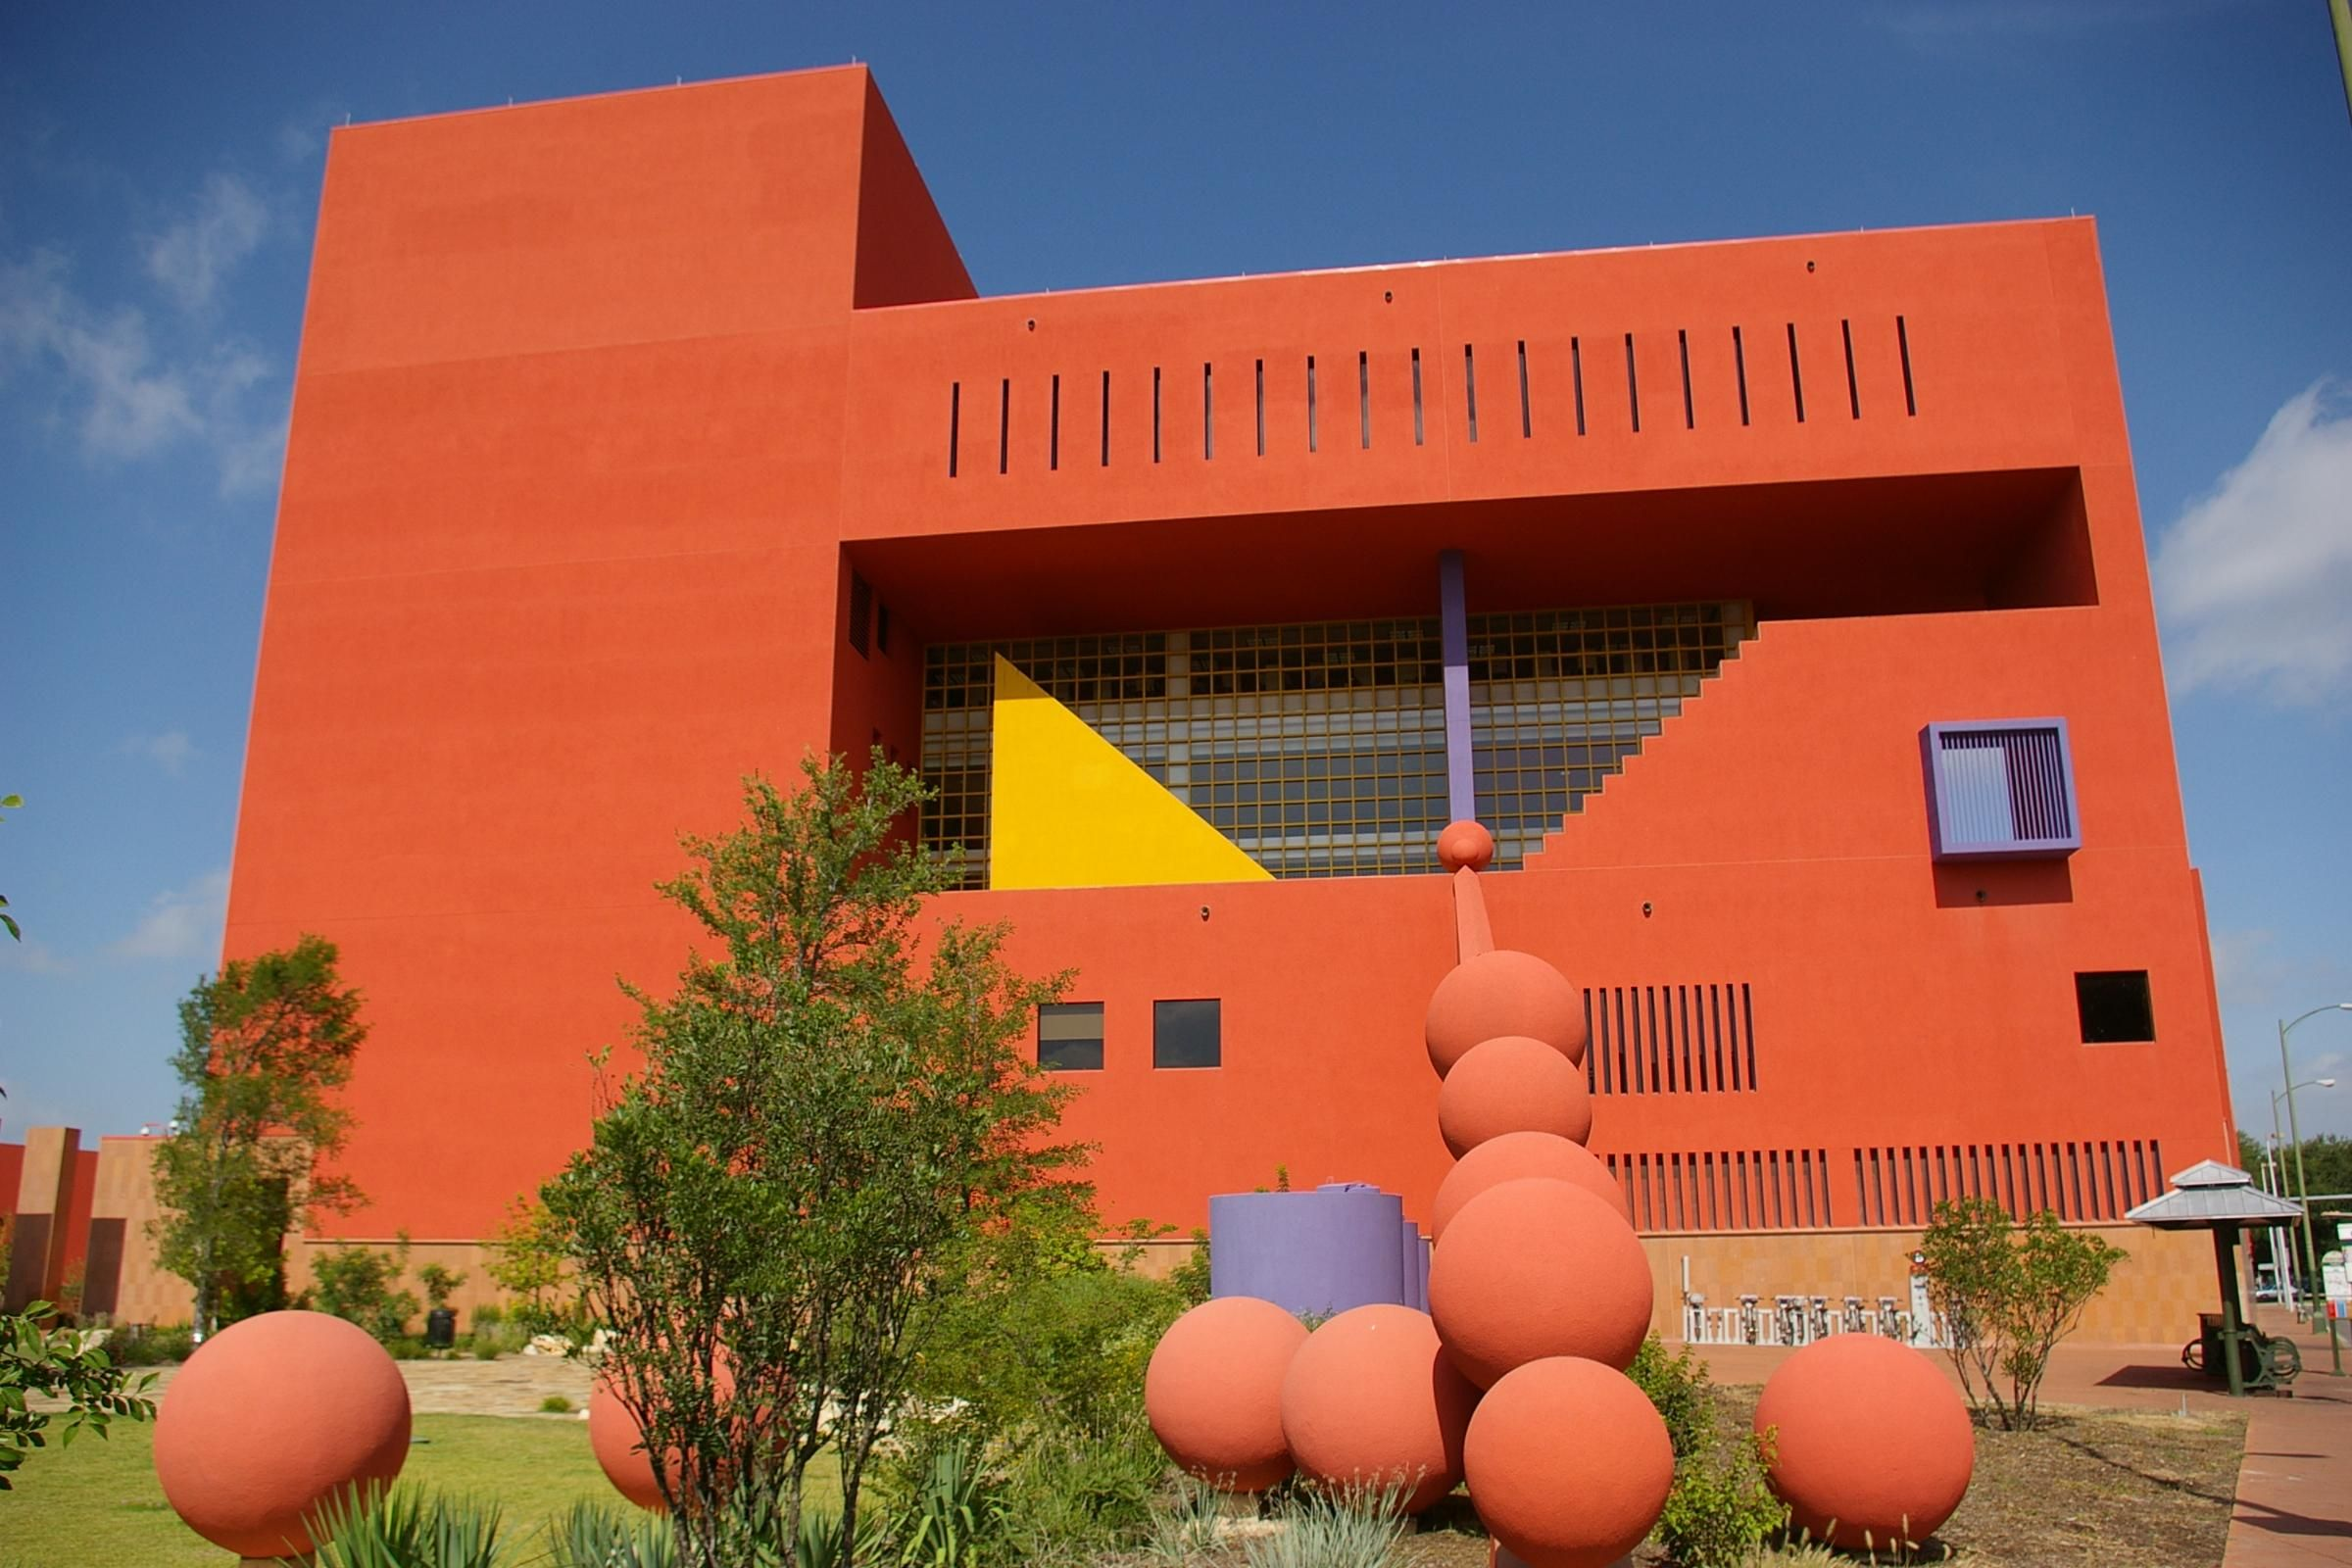 San Antonio Public Library Mexican Modernist Design